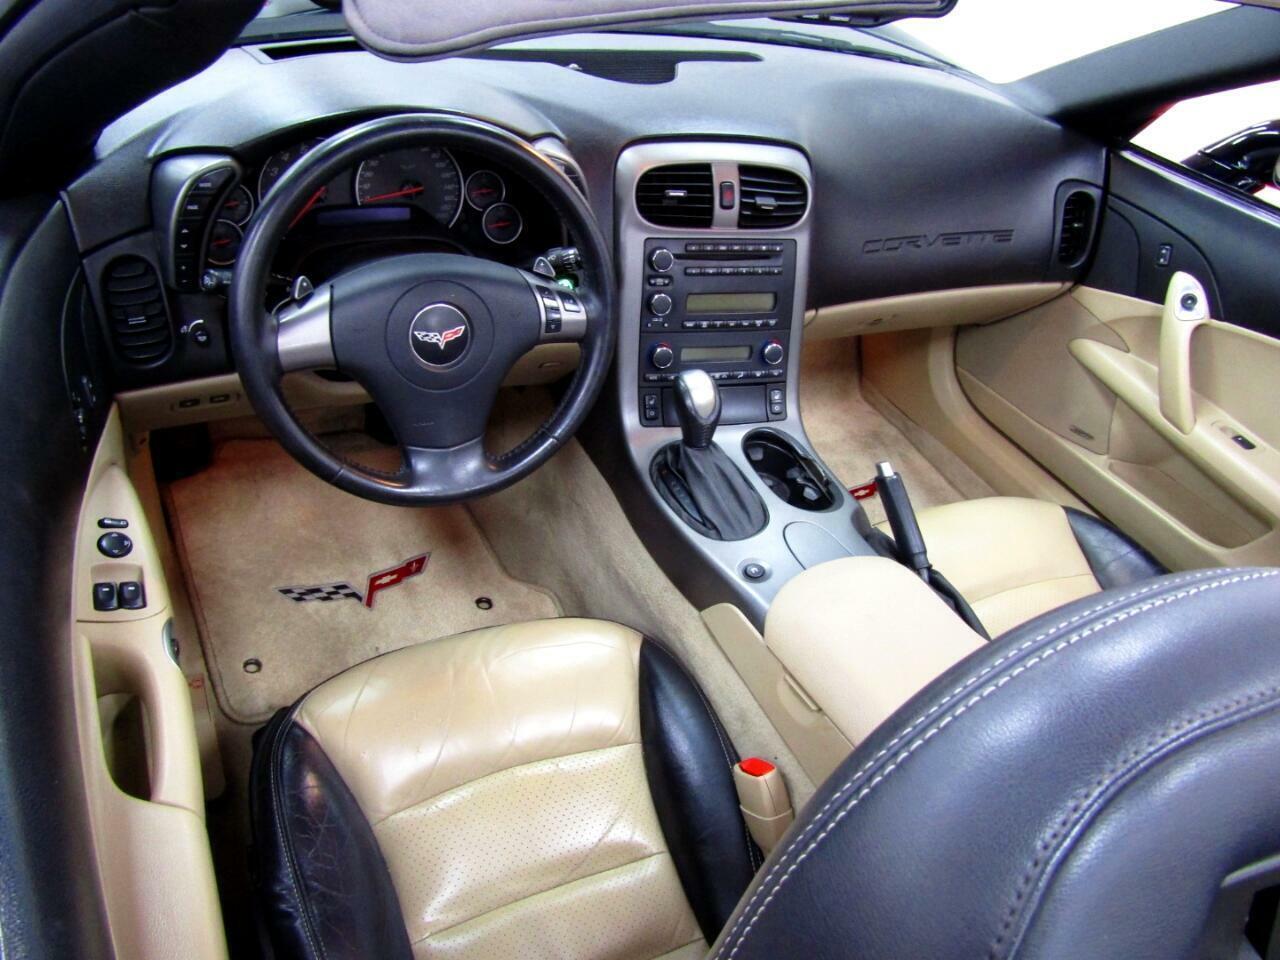 2007 Black Chevrolet Corvette Convertible    C6 Corvette Photo 6